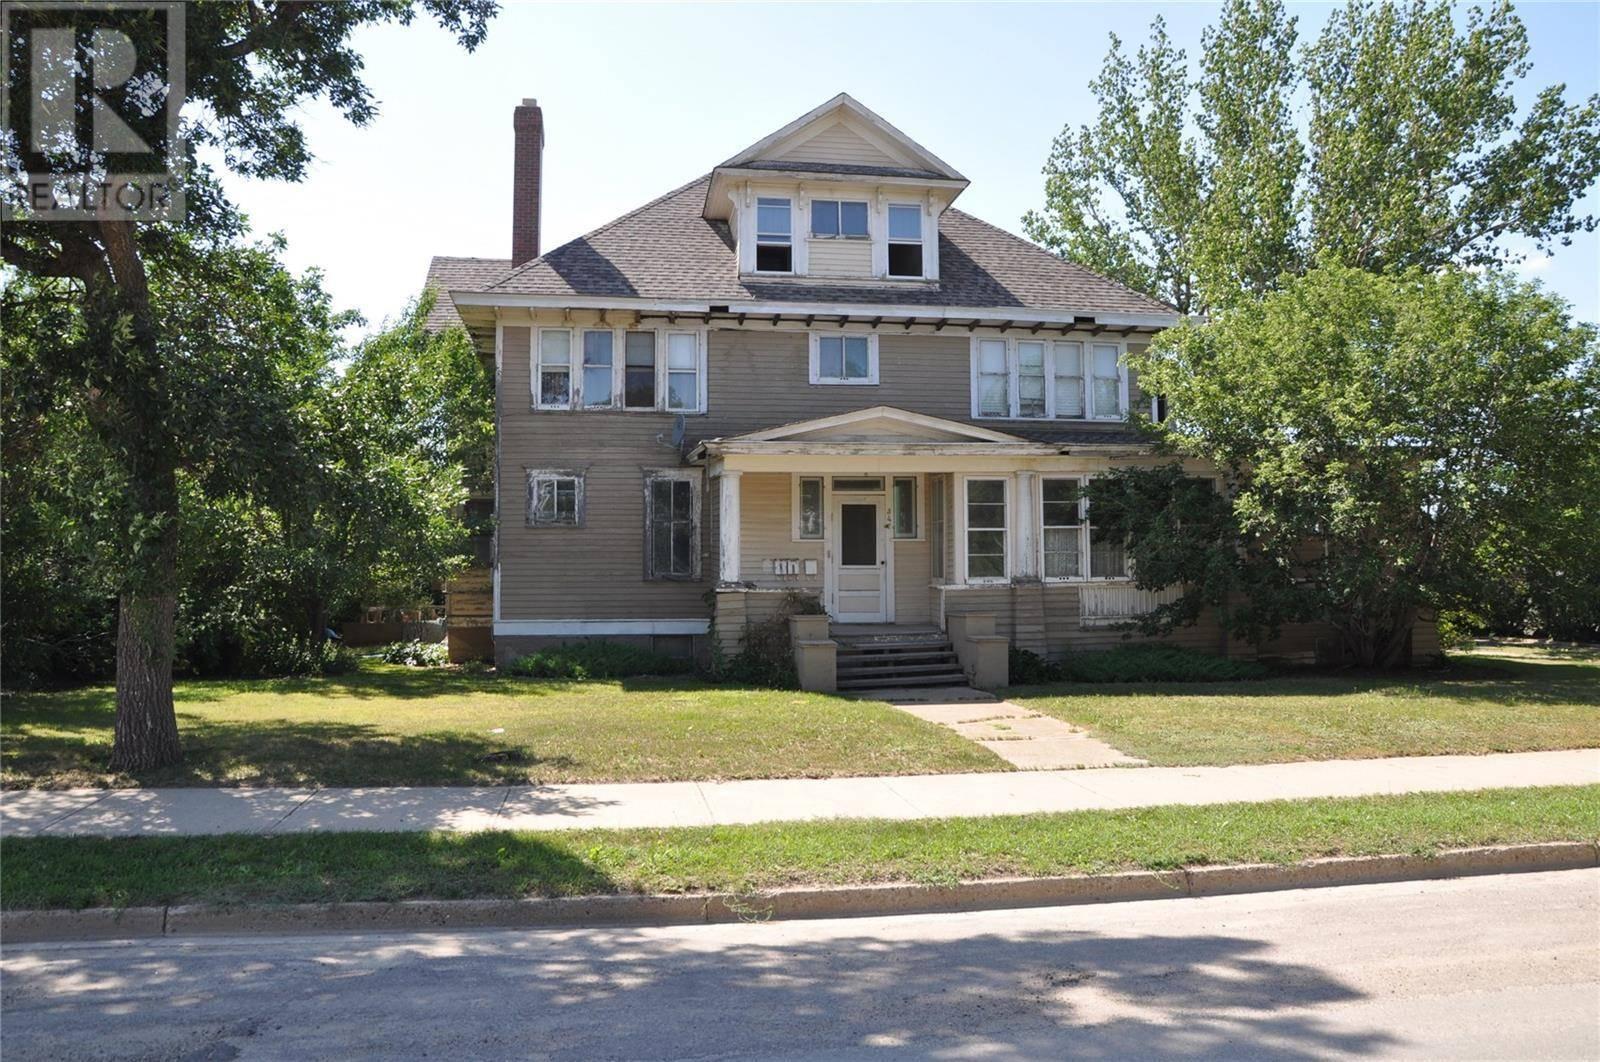 House for sale at 347 Government Rd N Weyburn Saskatchewan - MLS: SK766836